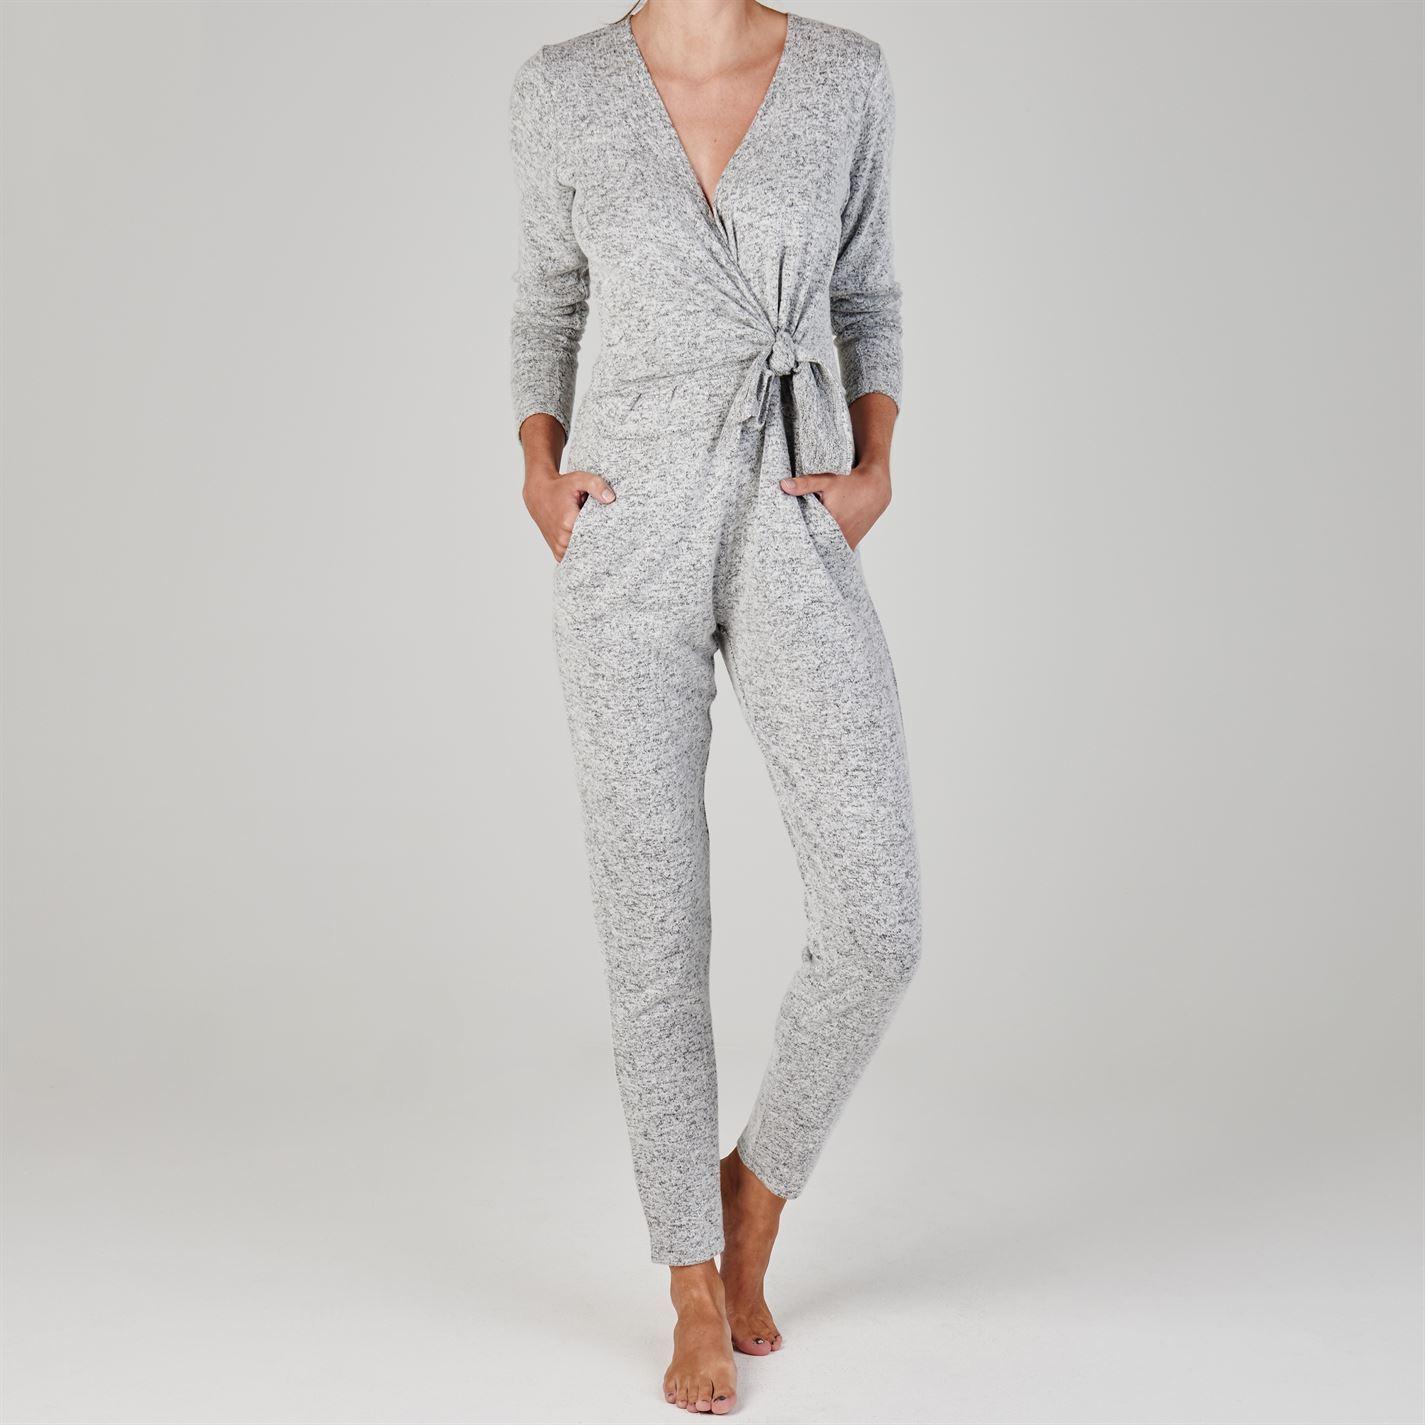 6e8cf52c73 Details about Golddigga Womens Wrap Jumpsuit Long Sleeve